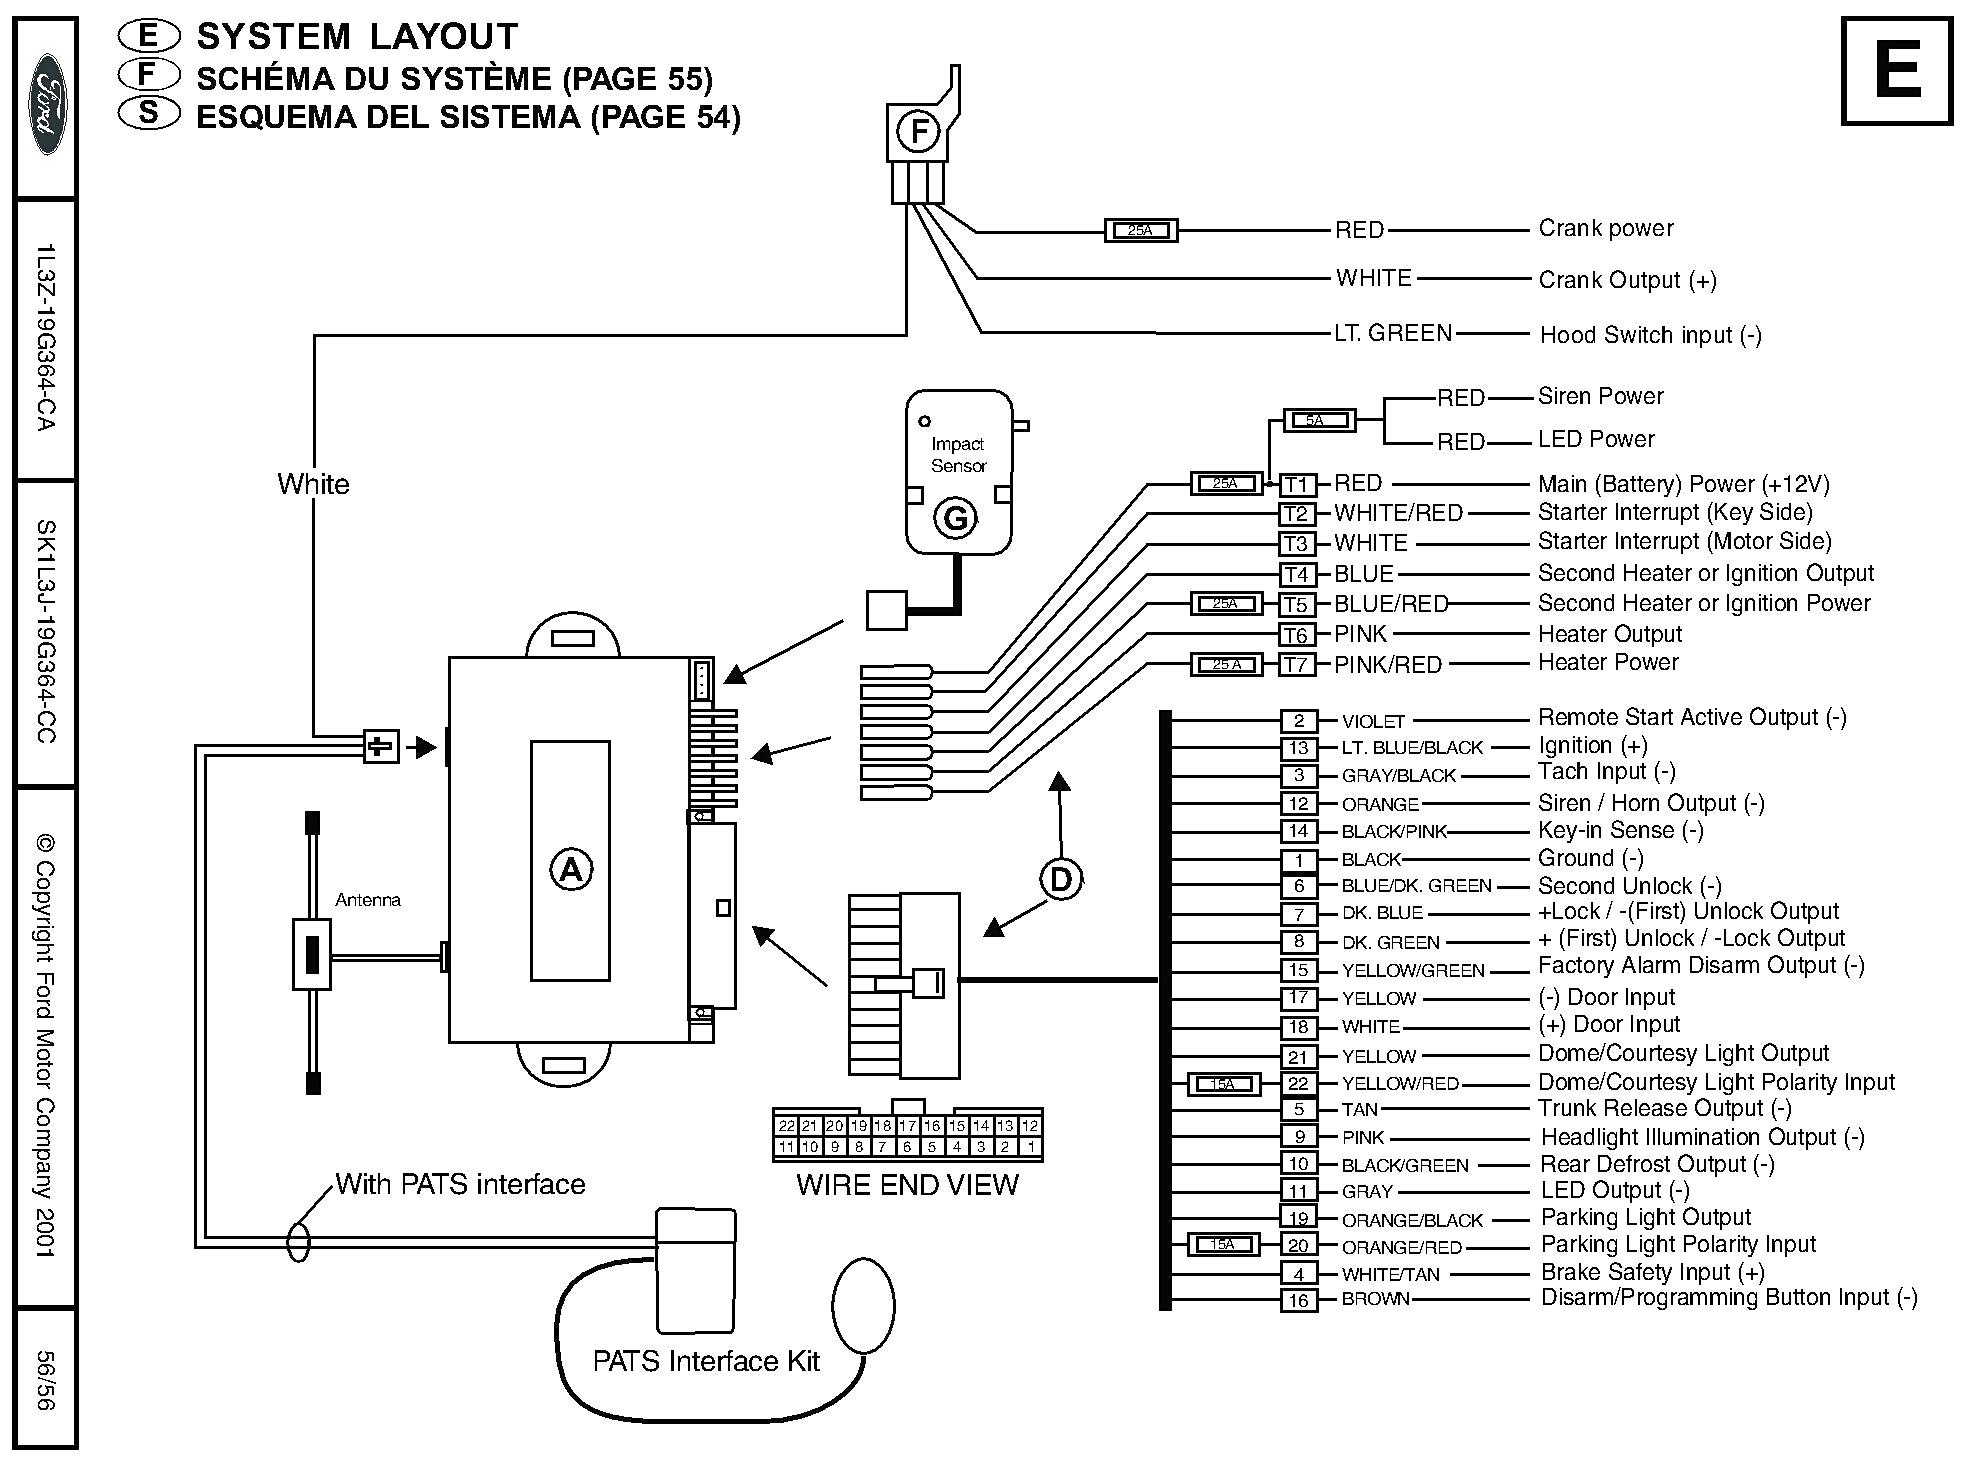 Ready Remote Wiring Diagram